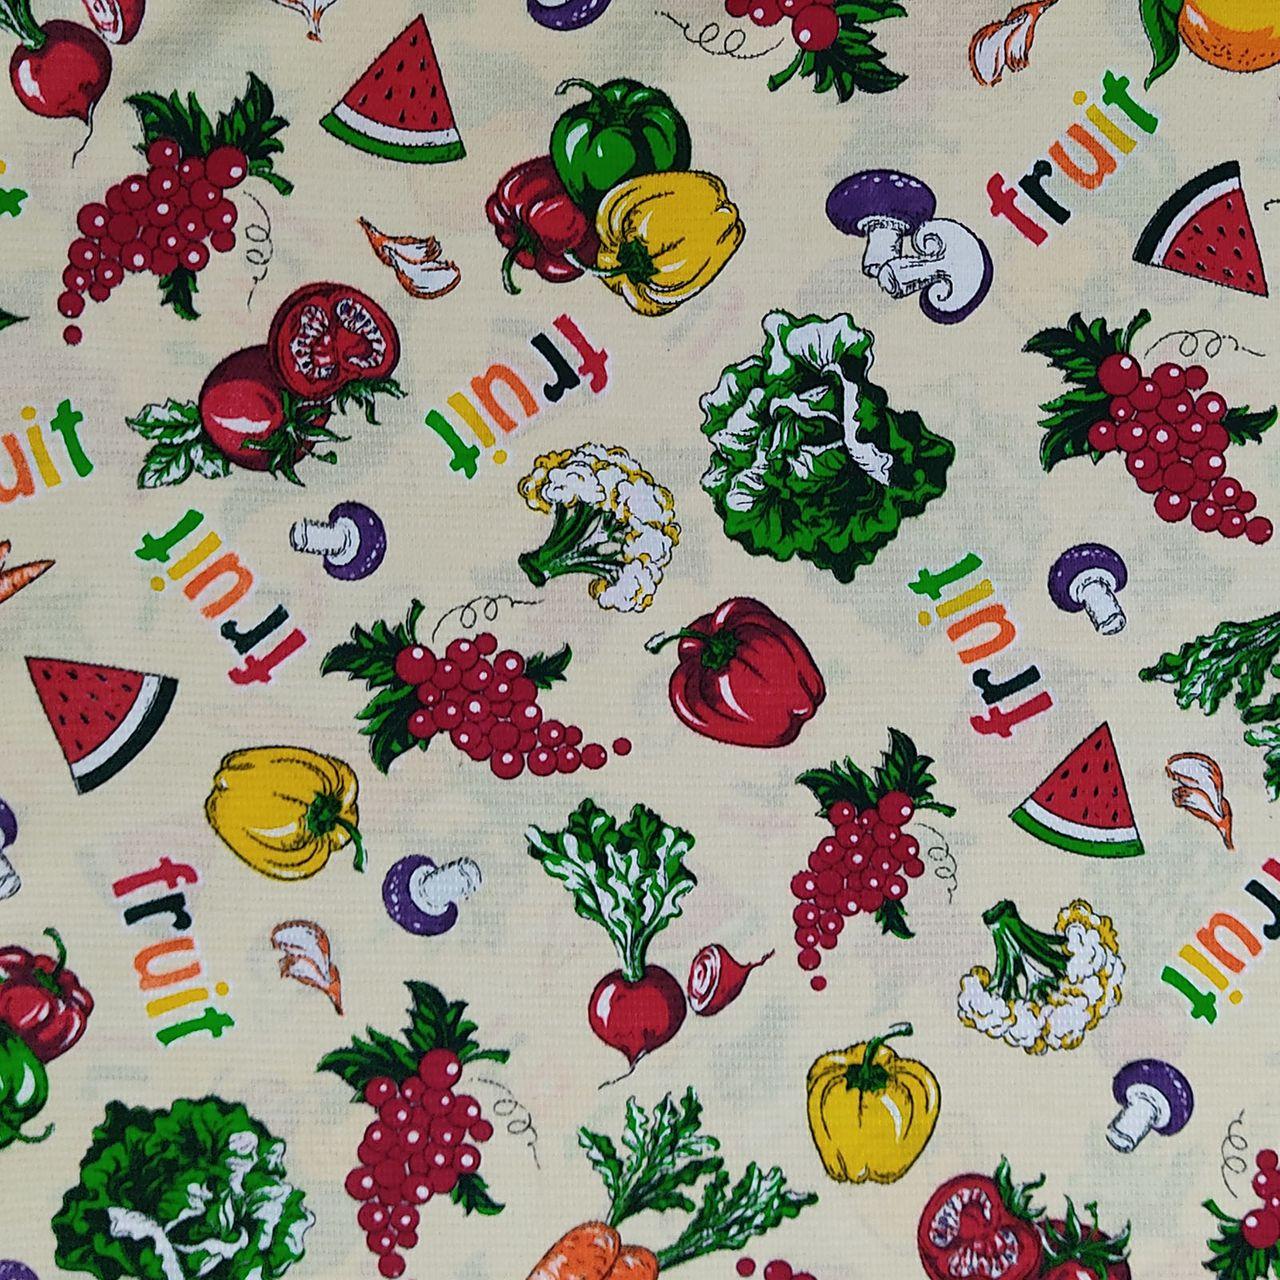 پارچه آشپزخانه طرح میوه کد 3